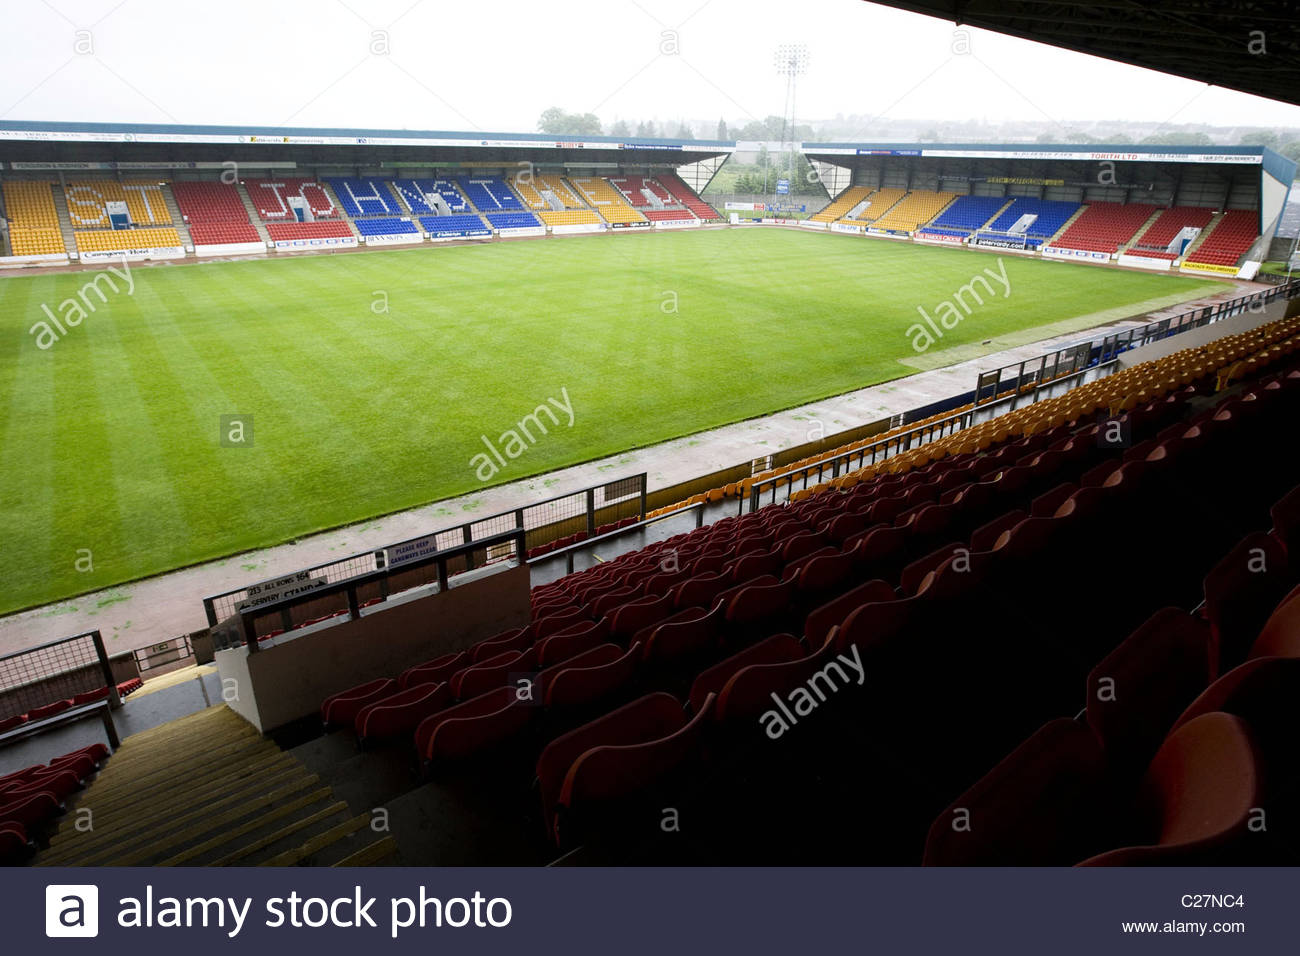 17.06.09 MCDIARMID PARK - PERTH GV des McDiarmid Park, Heimat des St. Johnstone FC Stockbild